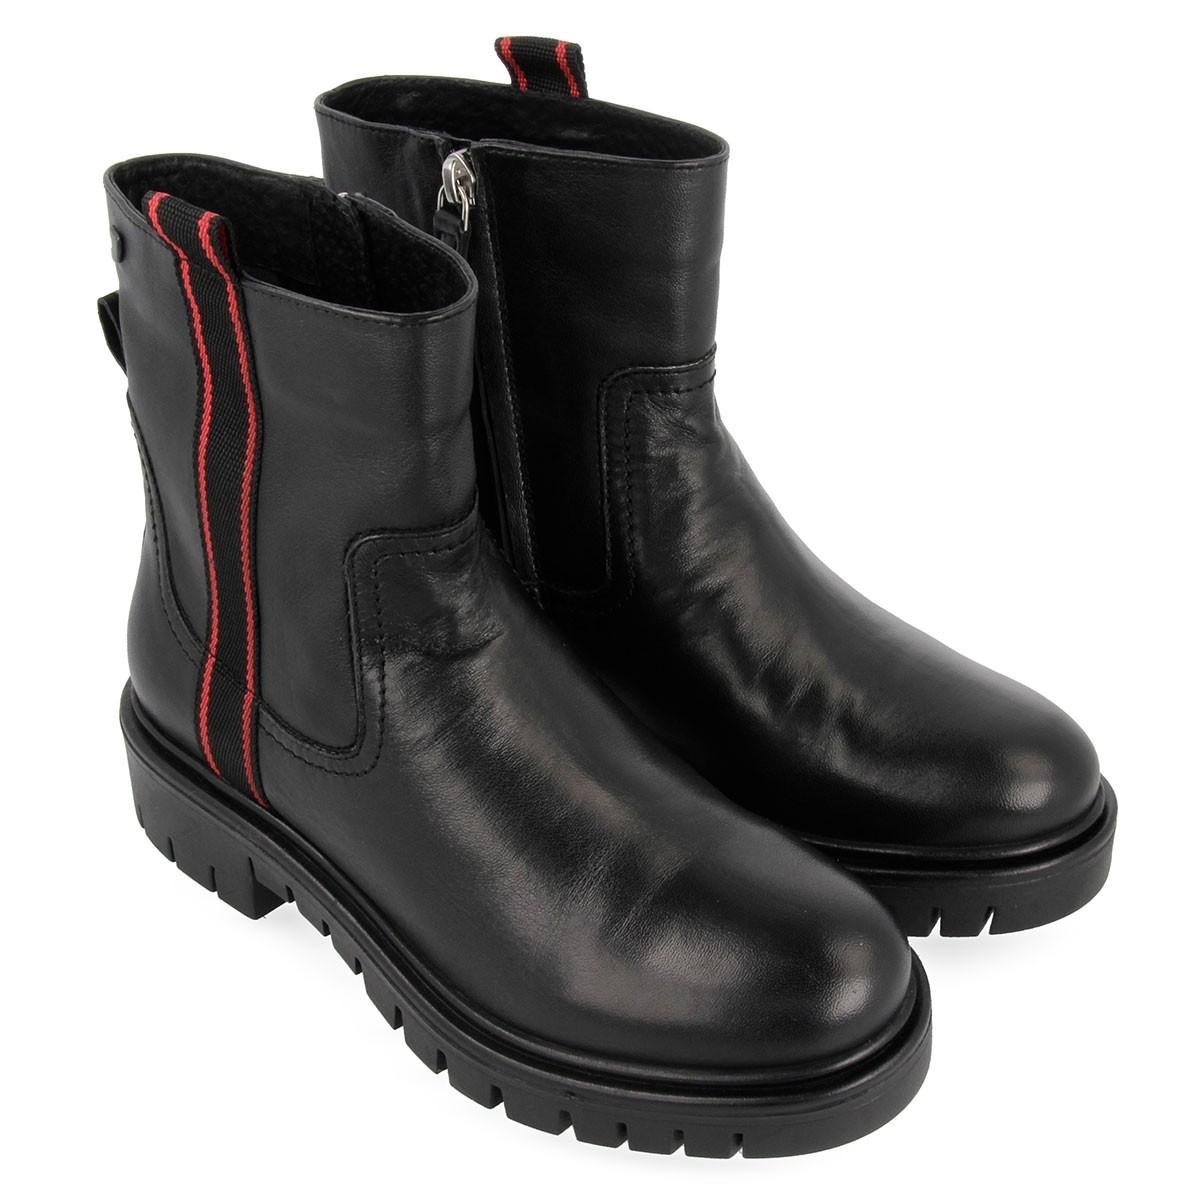 56554 Black BOOTS 5